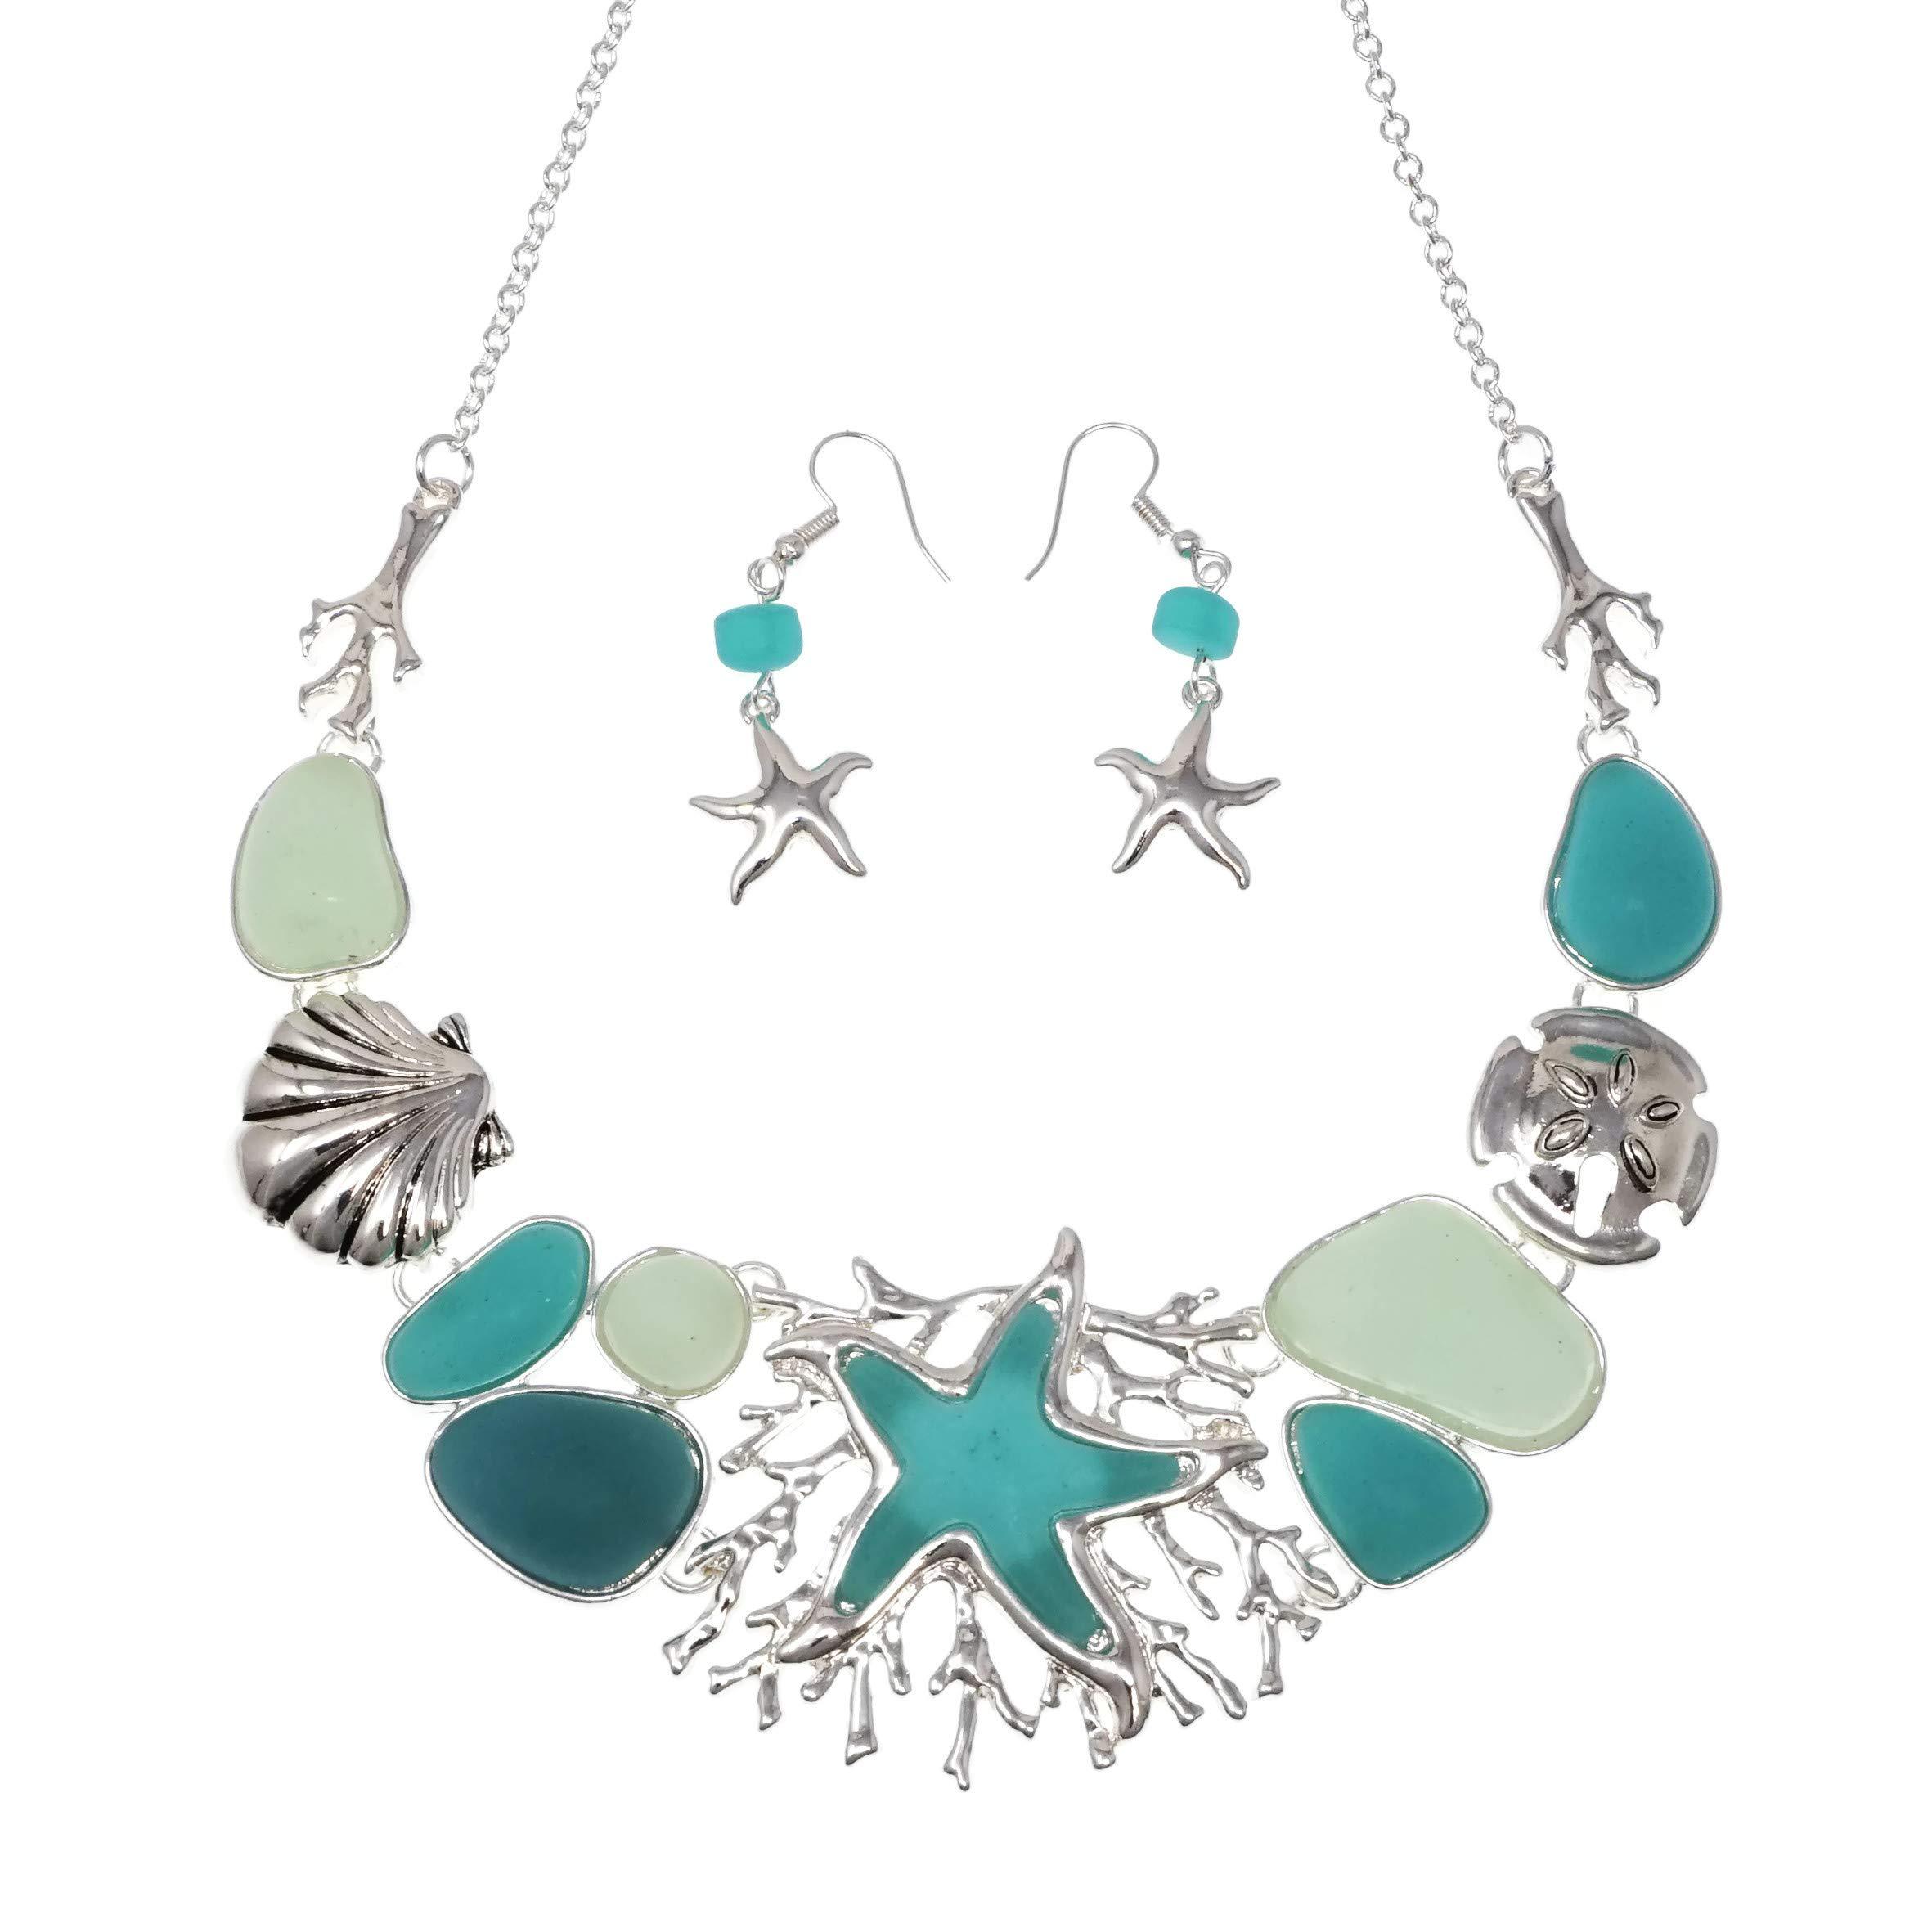 Elosee Mixed Sealife Theme Seaglass Multi Tone Bib Statement 18'' Necklace & Matching Earrings